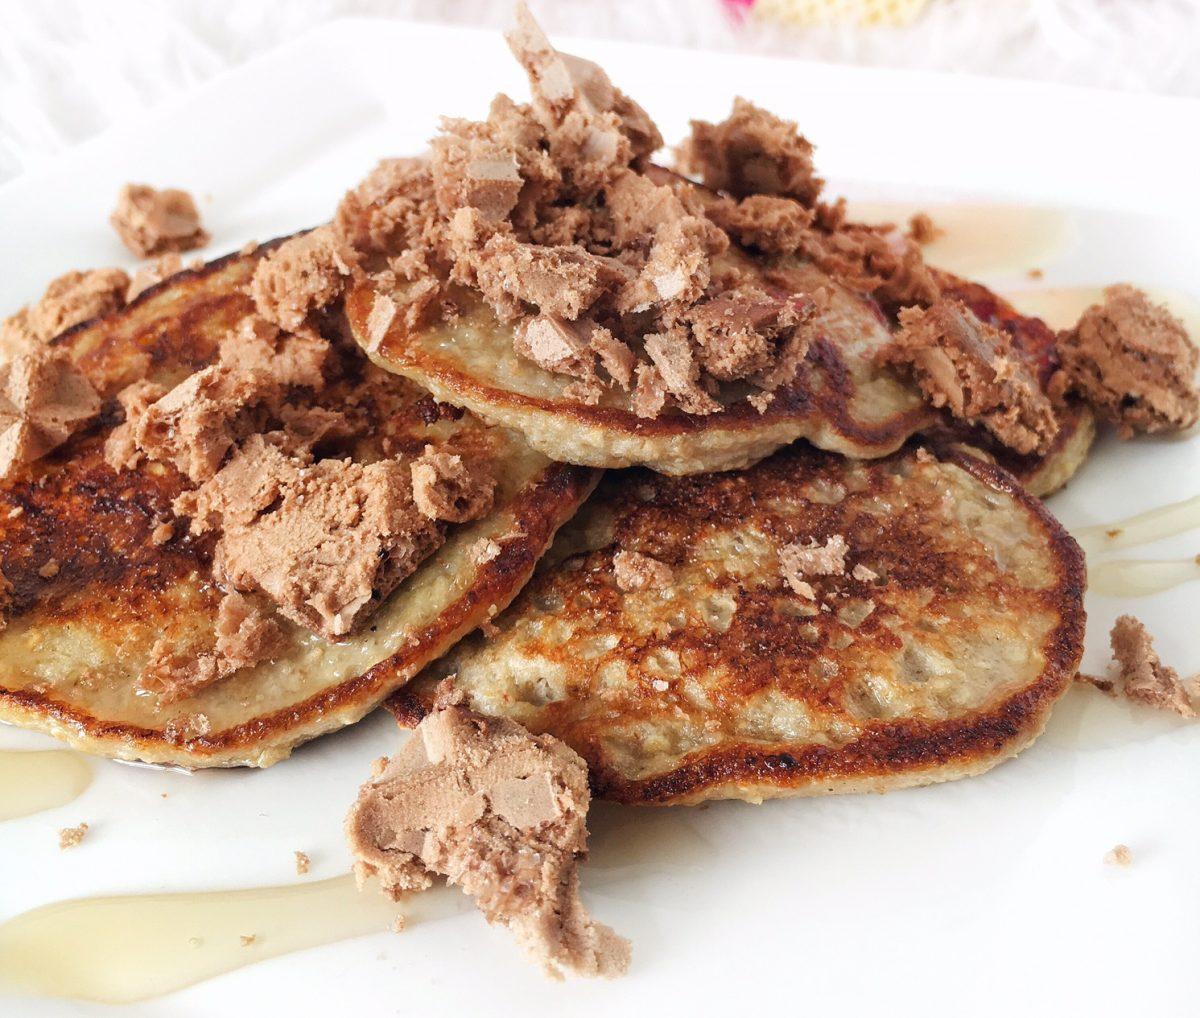 Recept: Crunchy healthy pancakes